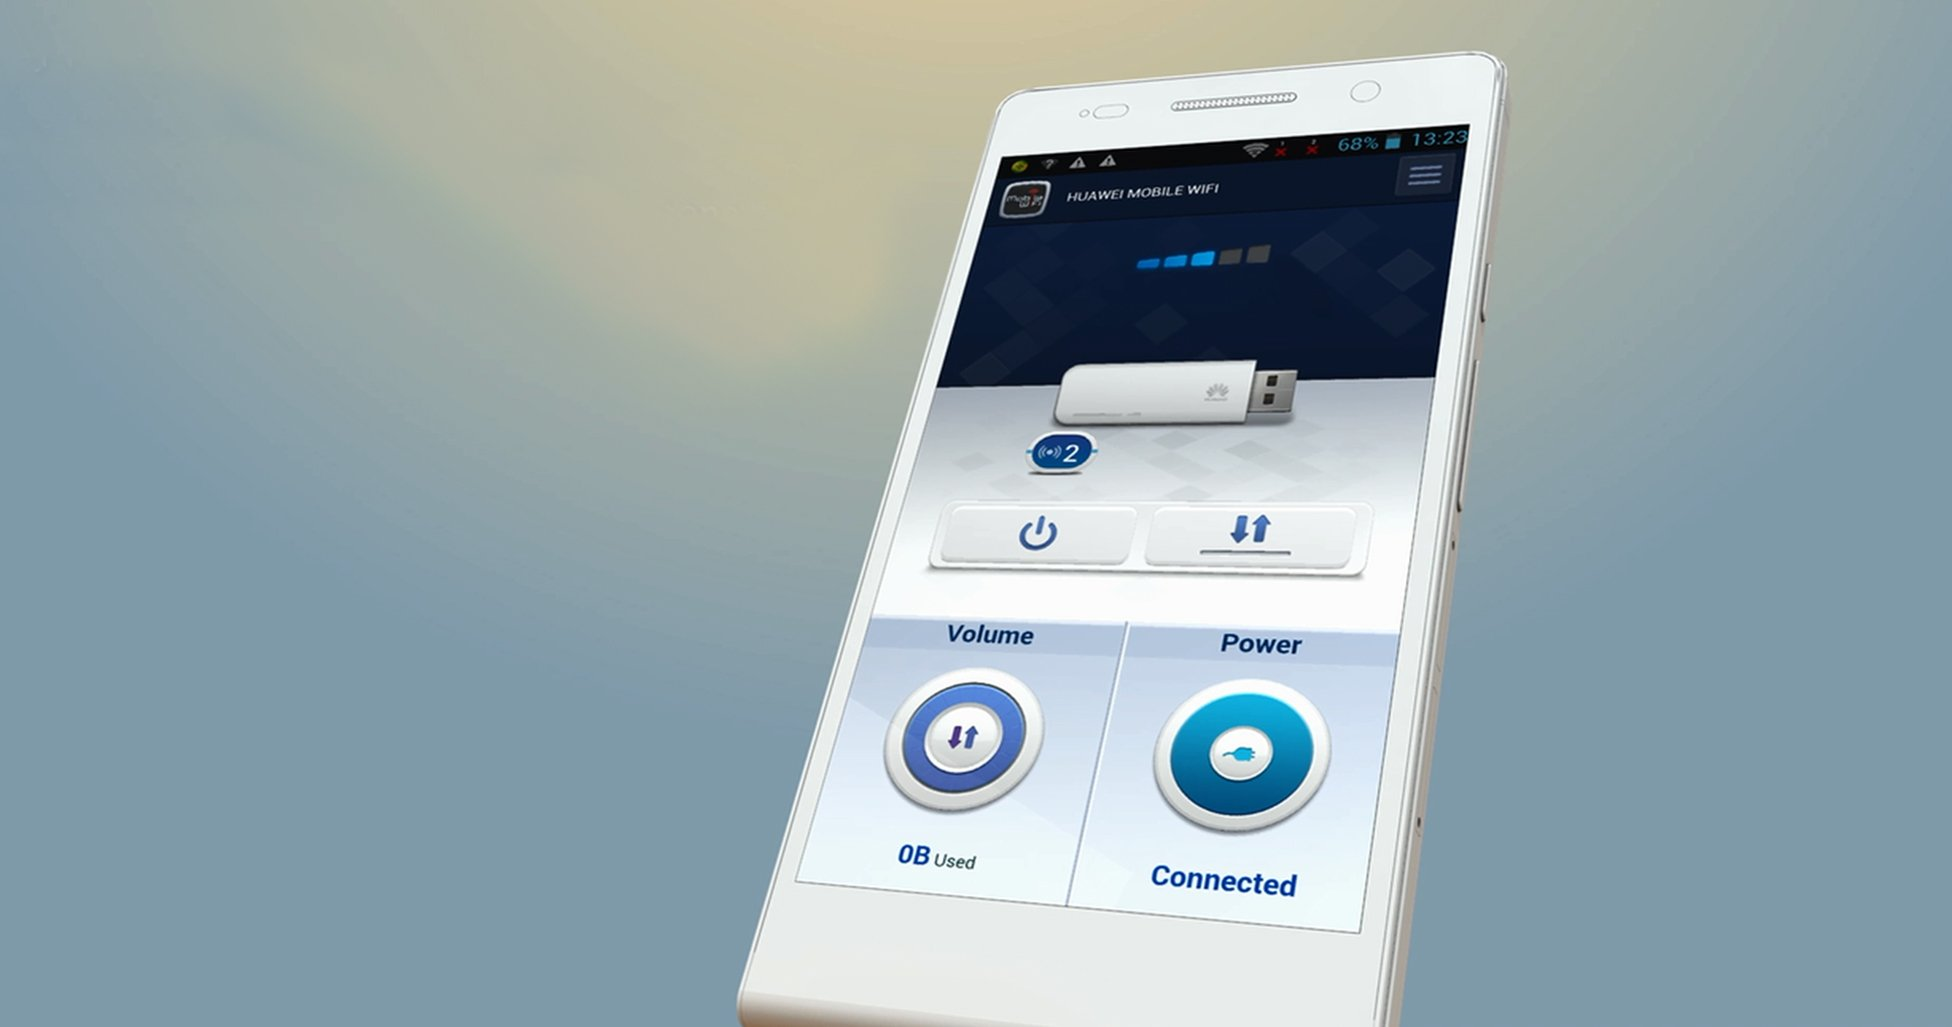 Huawei Mobile: Huawei E8231 3G SIM Free Mobile Wingle Including: Amazon